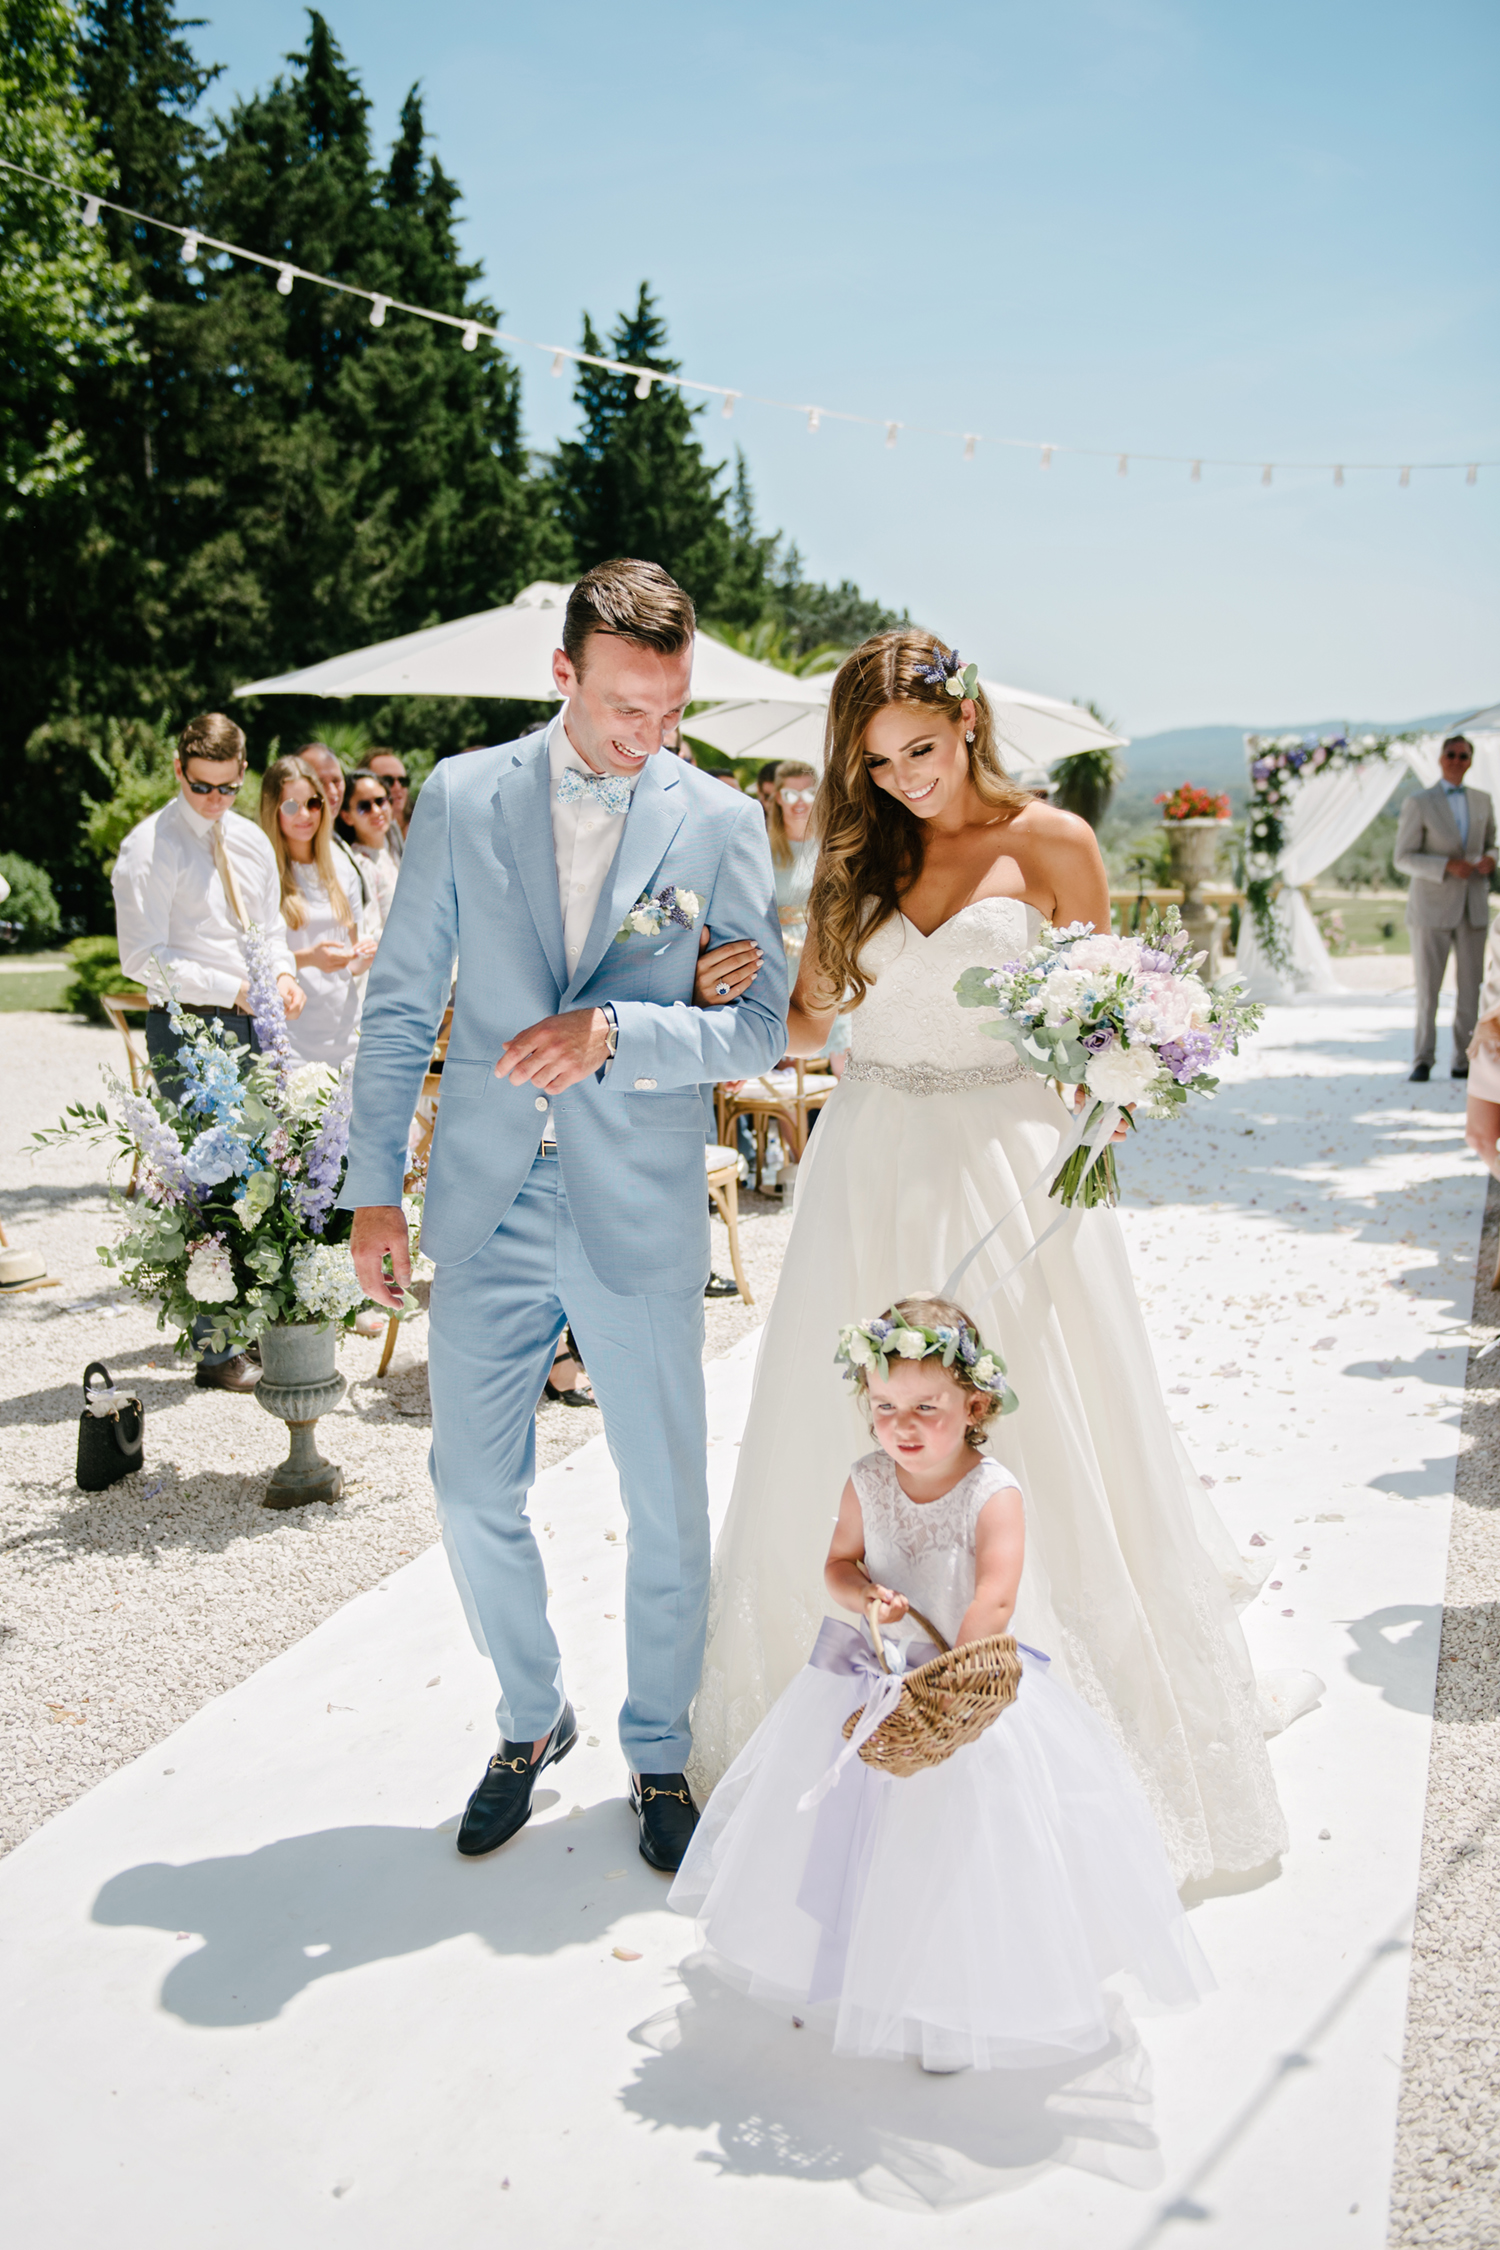 Chateau-Robernier-Wedding-Photographer-0066.jpg